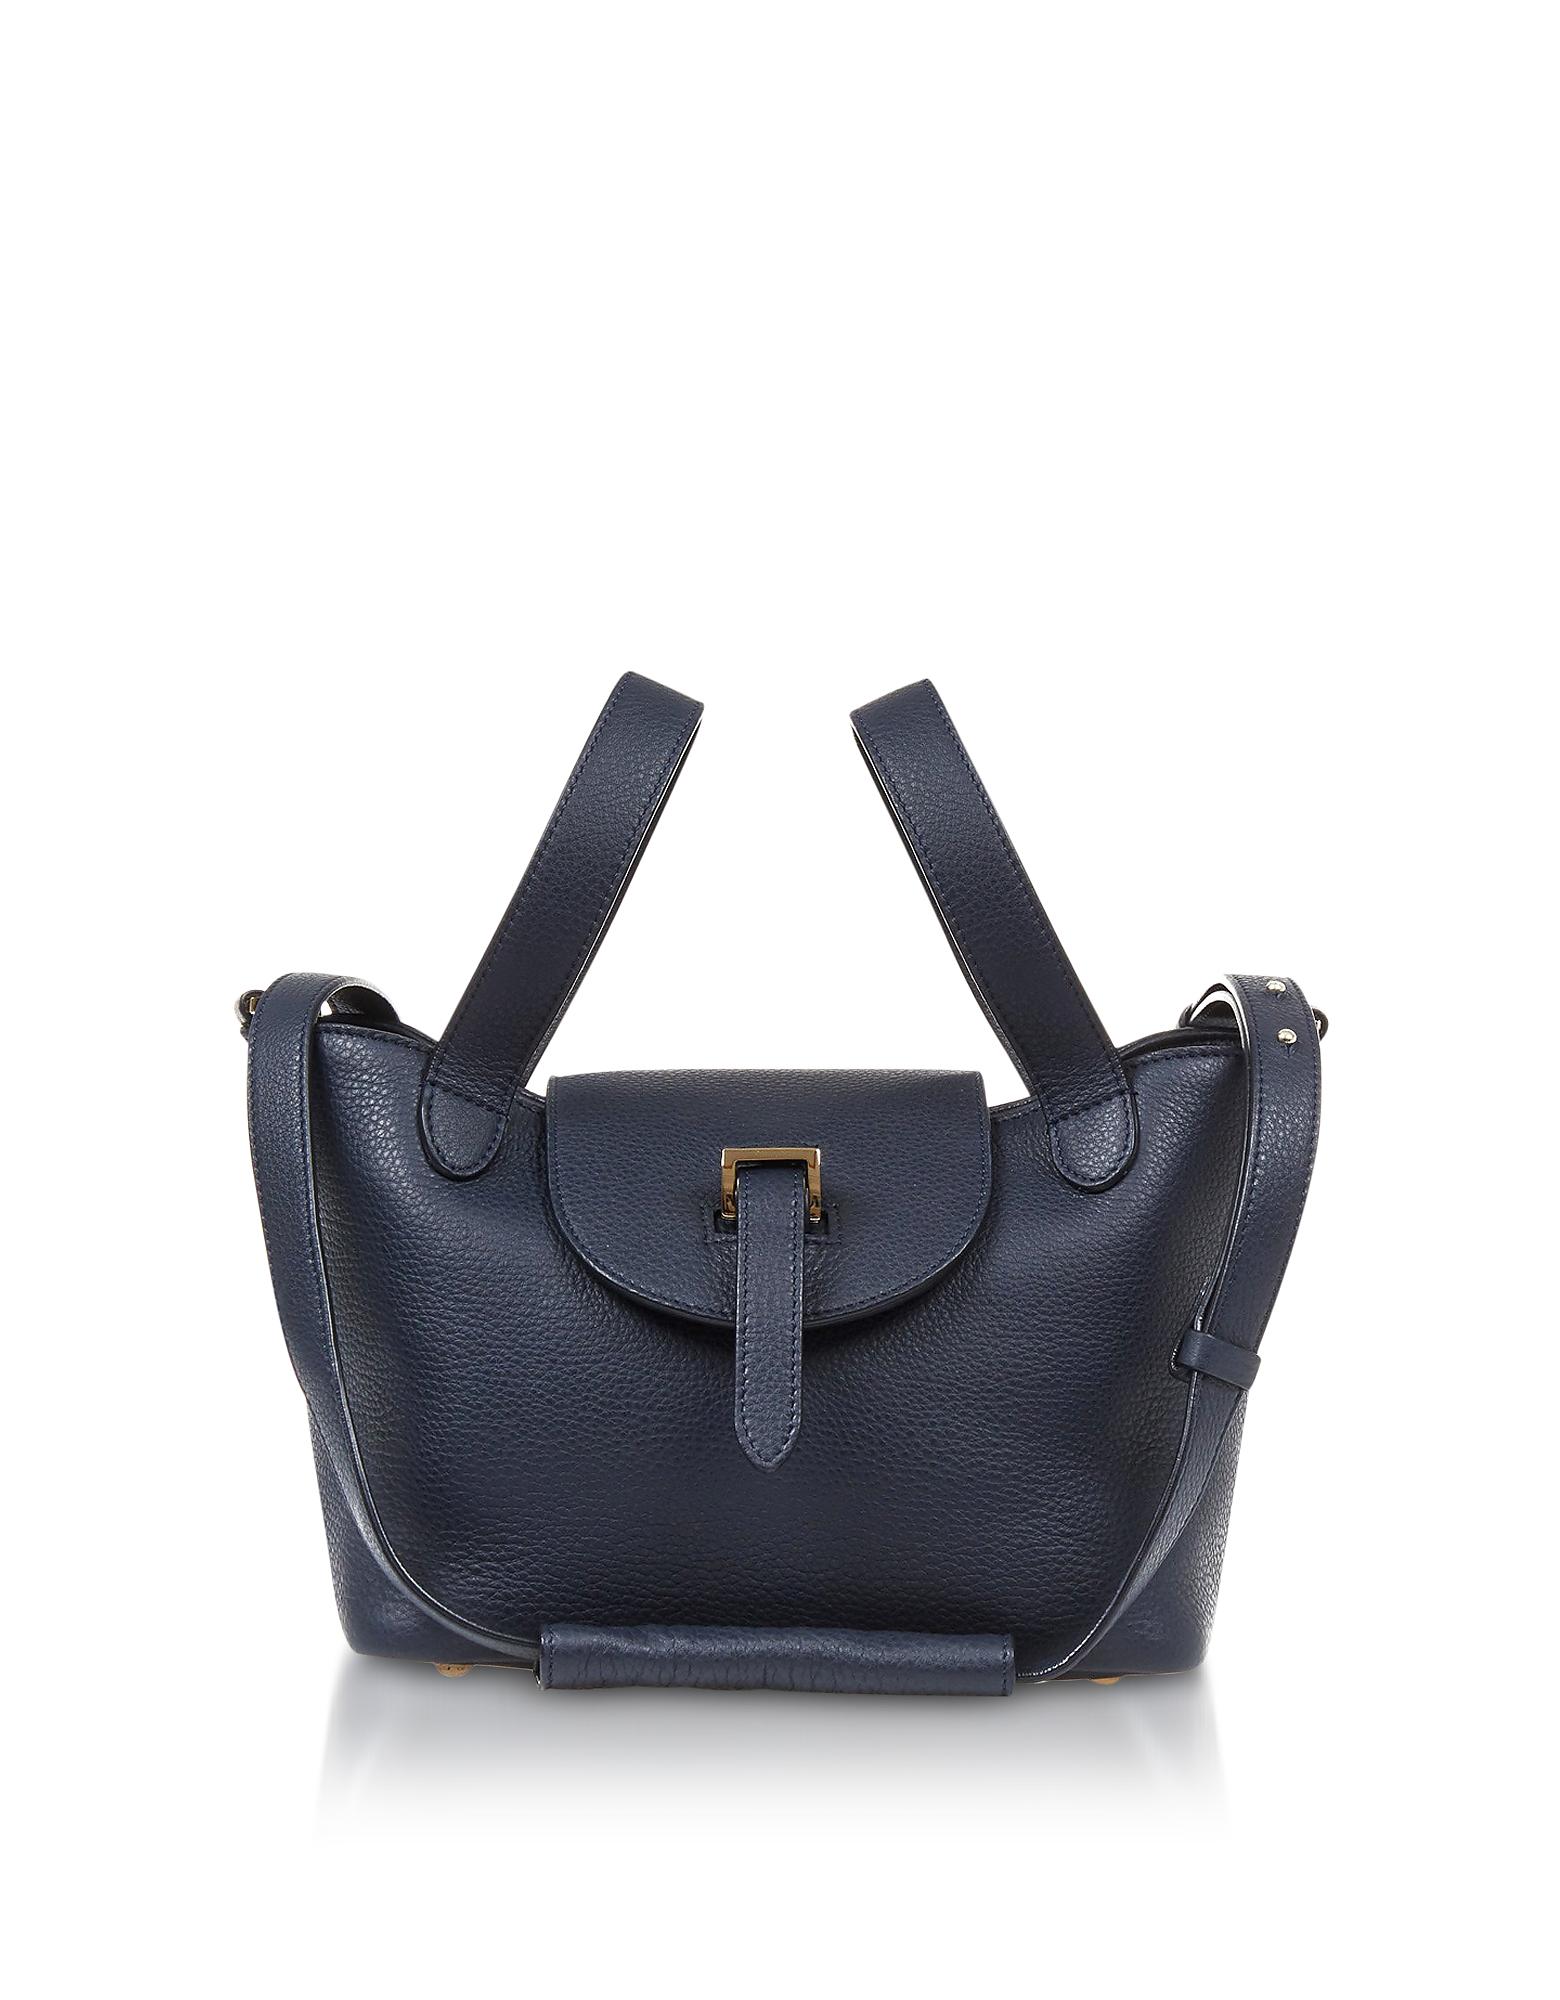 Image of Meli Melo Designer Handbags, Thela Mini Tote Bag